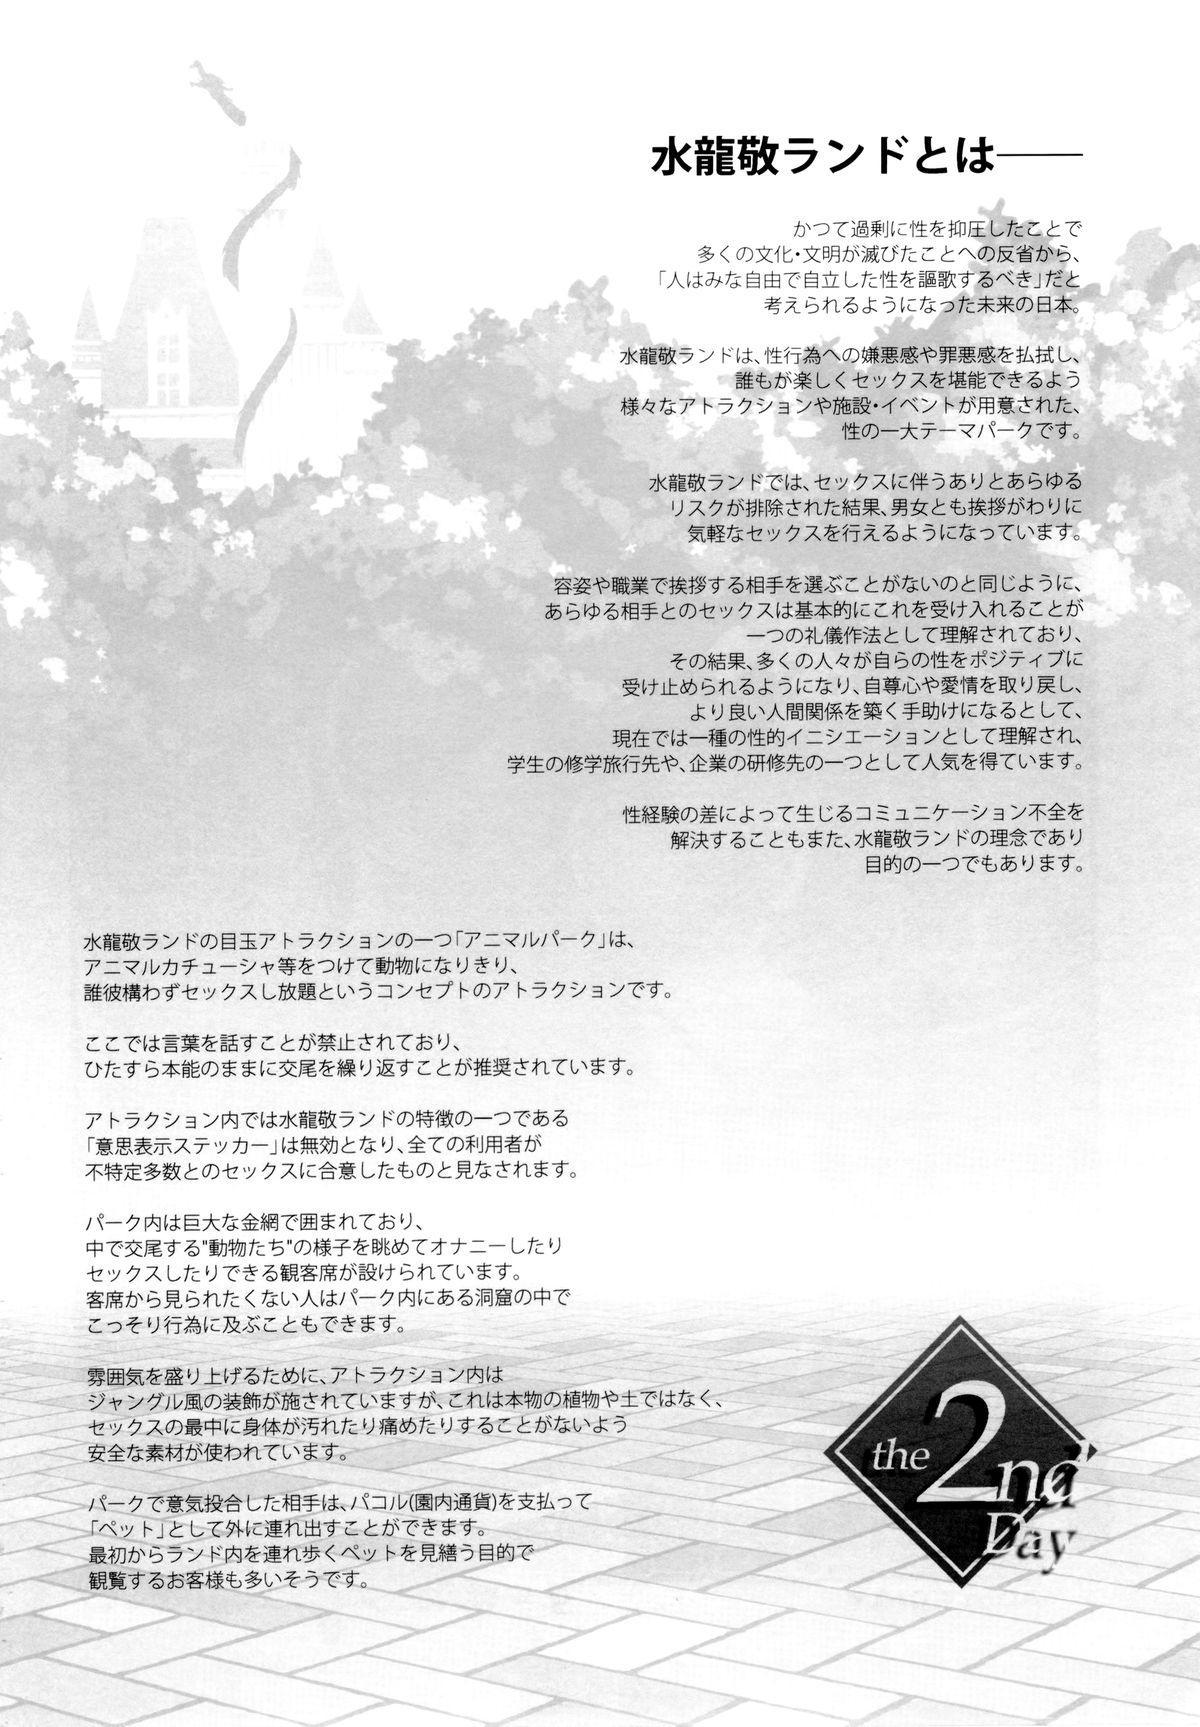 Oideyo! Mizuryu Kei Land the 2nd Day 3